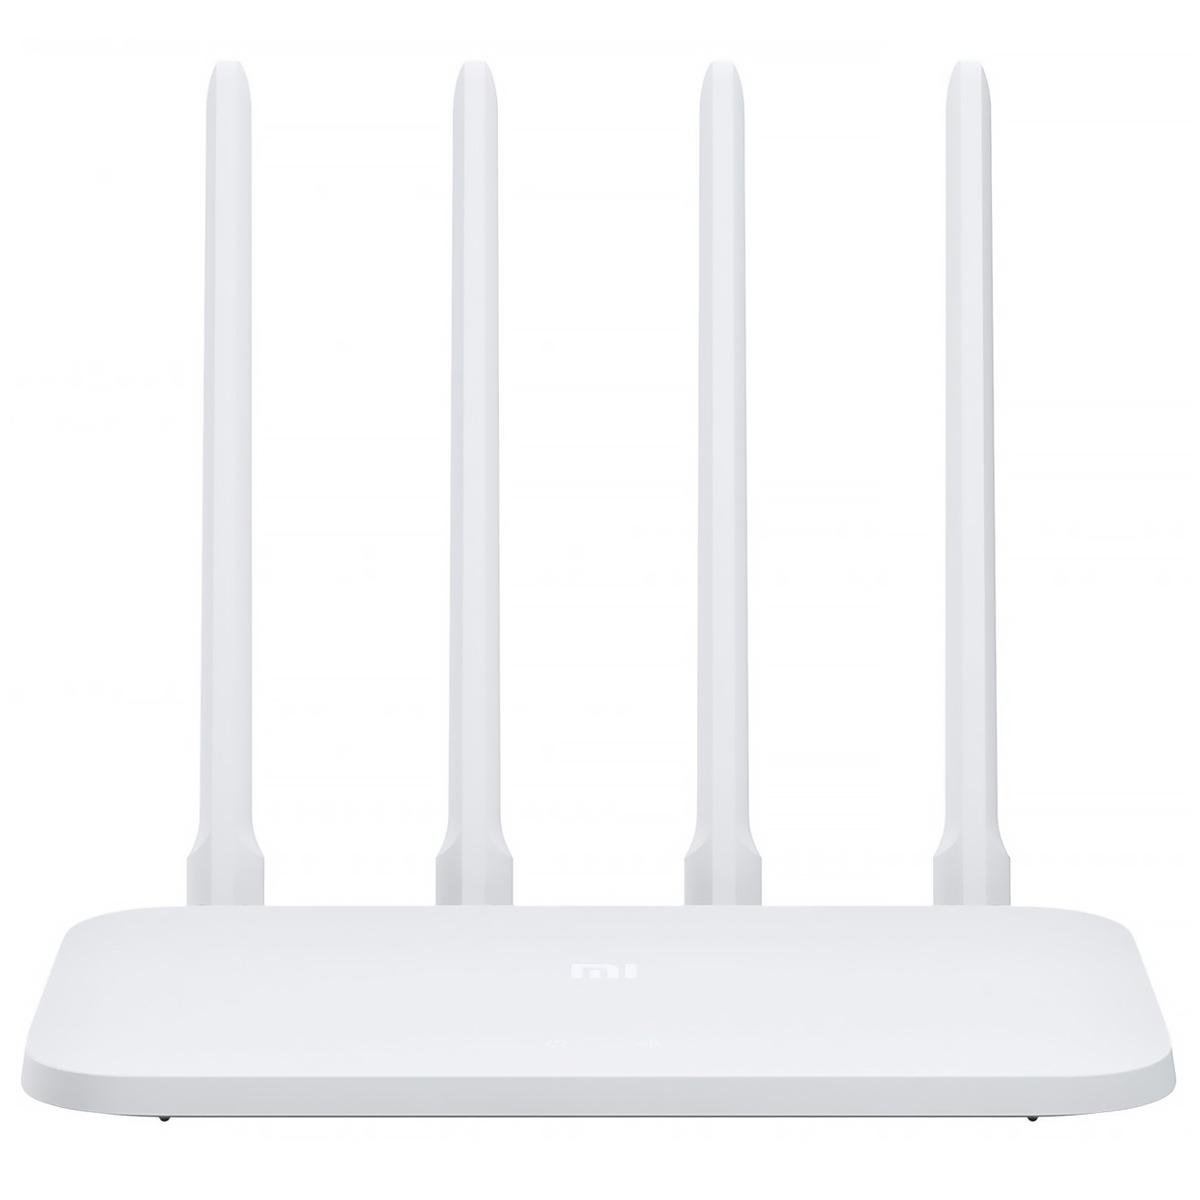 Wi-Fi роутер (маршрутизатор) Xiaomi Mi WiFi Router 4C